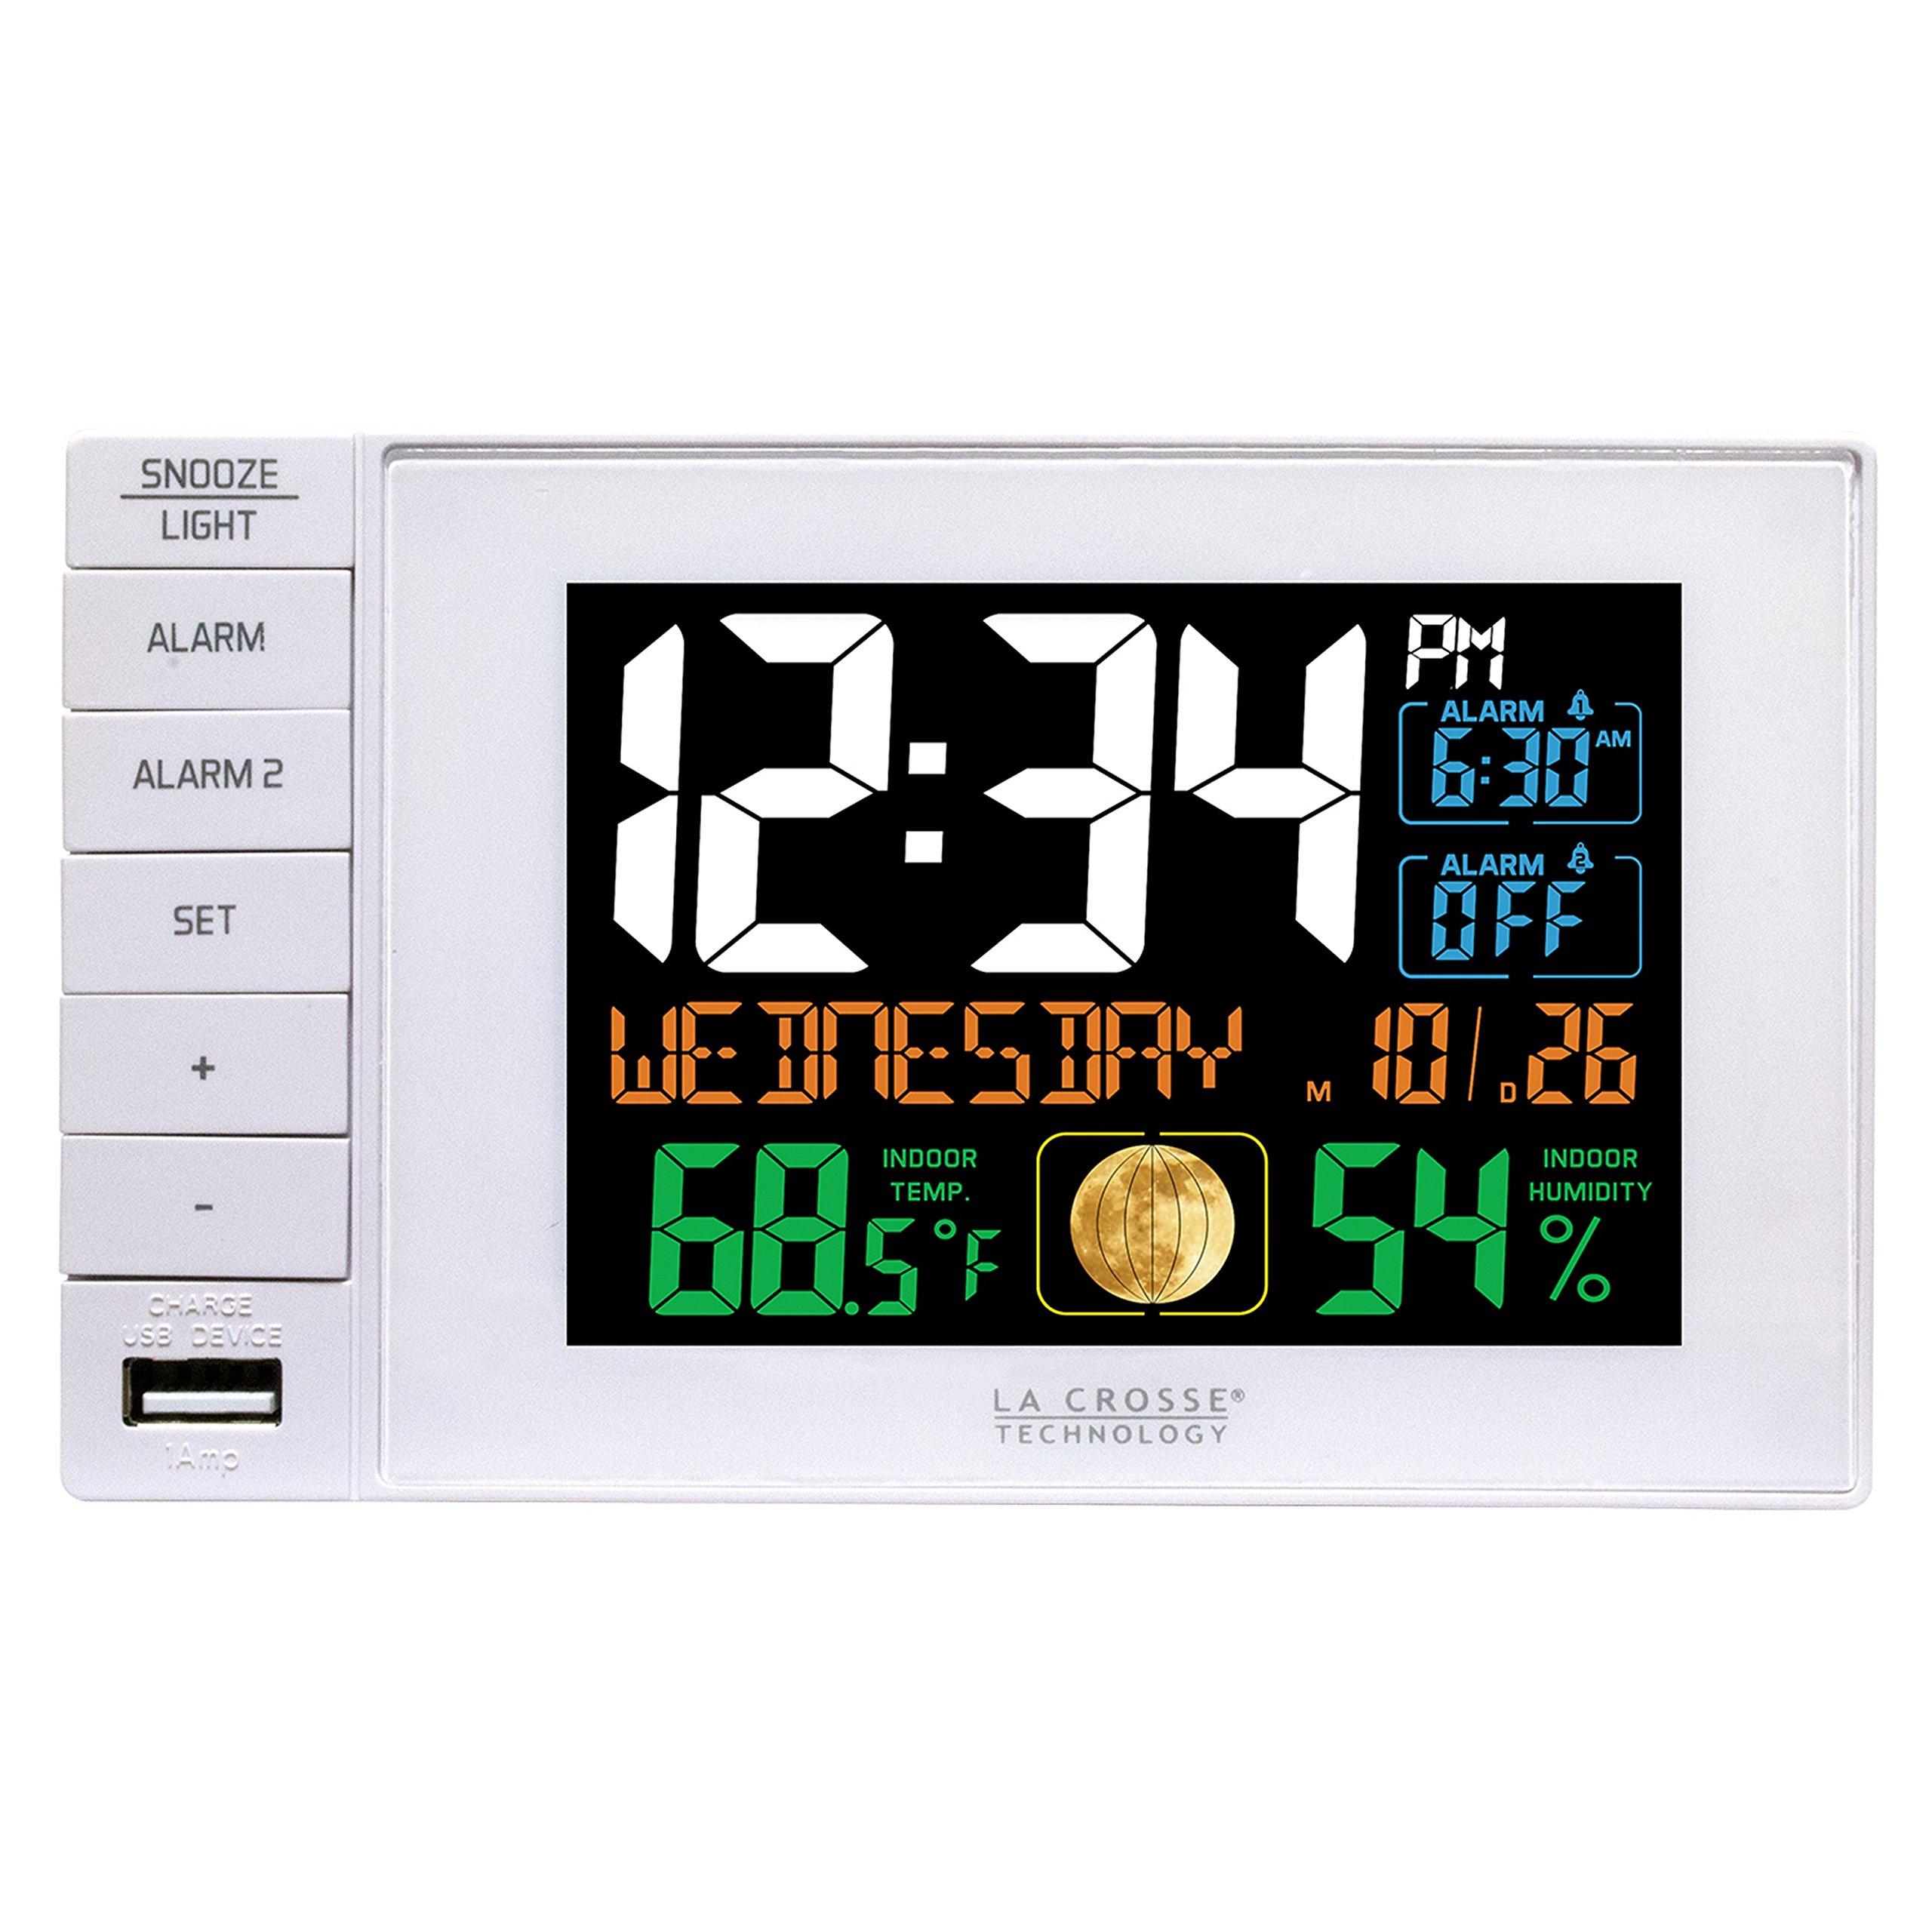 La Crosse Technology C87061 Color Dual Alarm Clock with USB Charging Port,